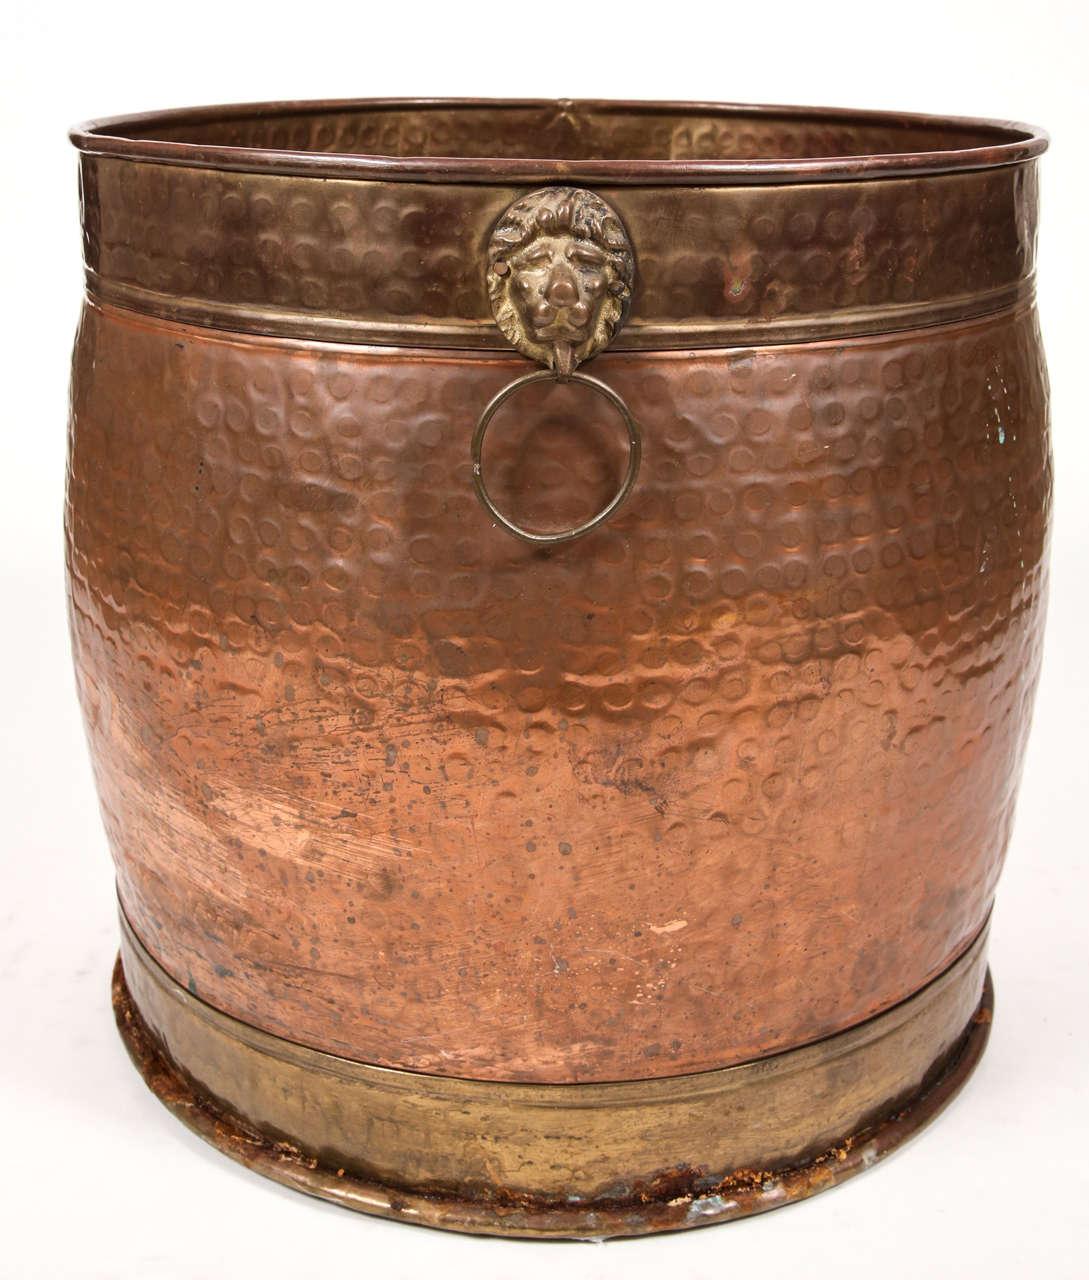 Hammered Copper Pot 7